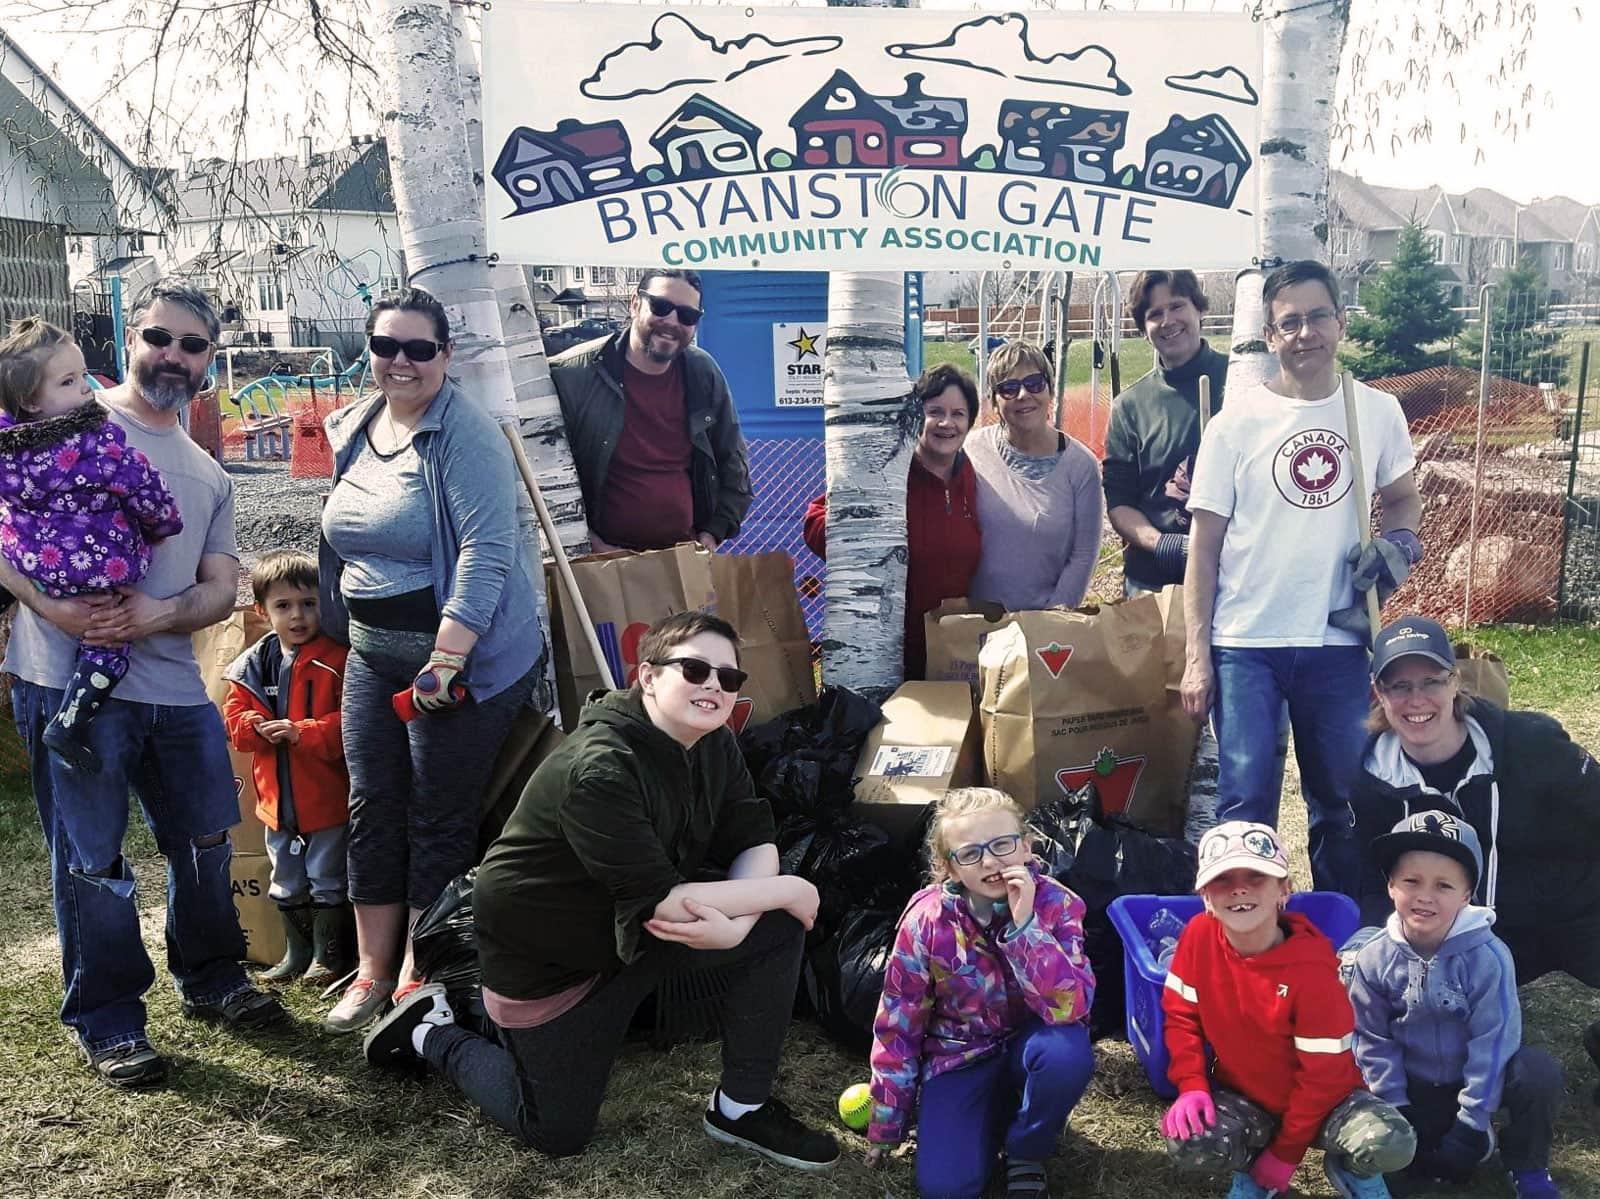 The Bryanston Gate Community Association organized a clean-up in their neighbourhood park